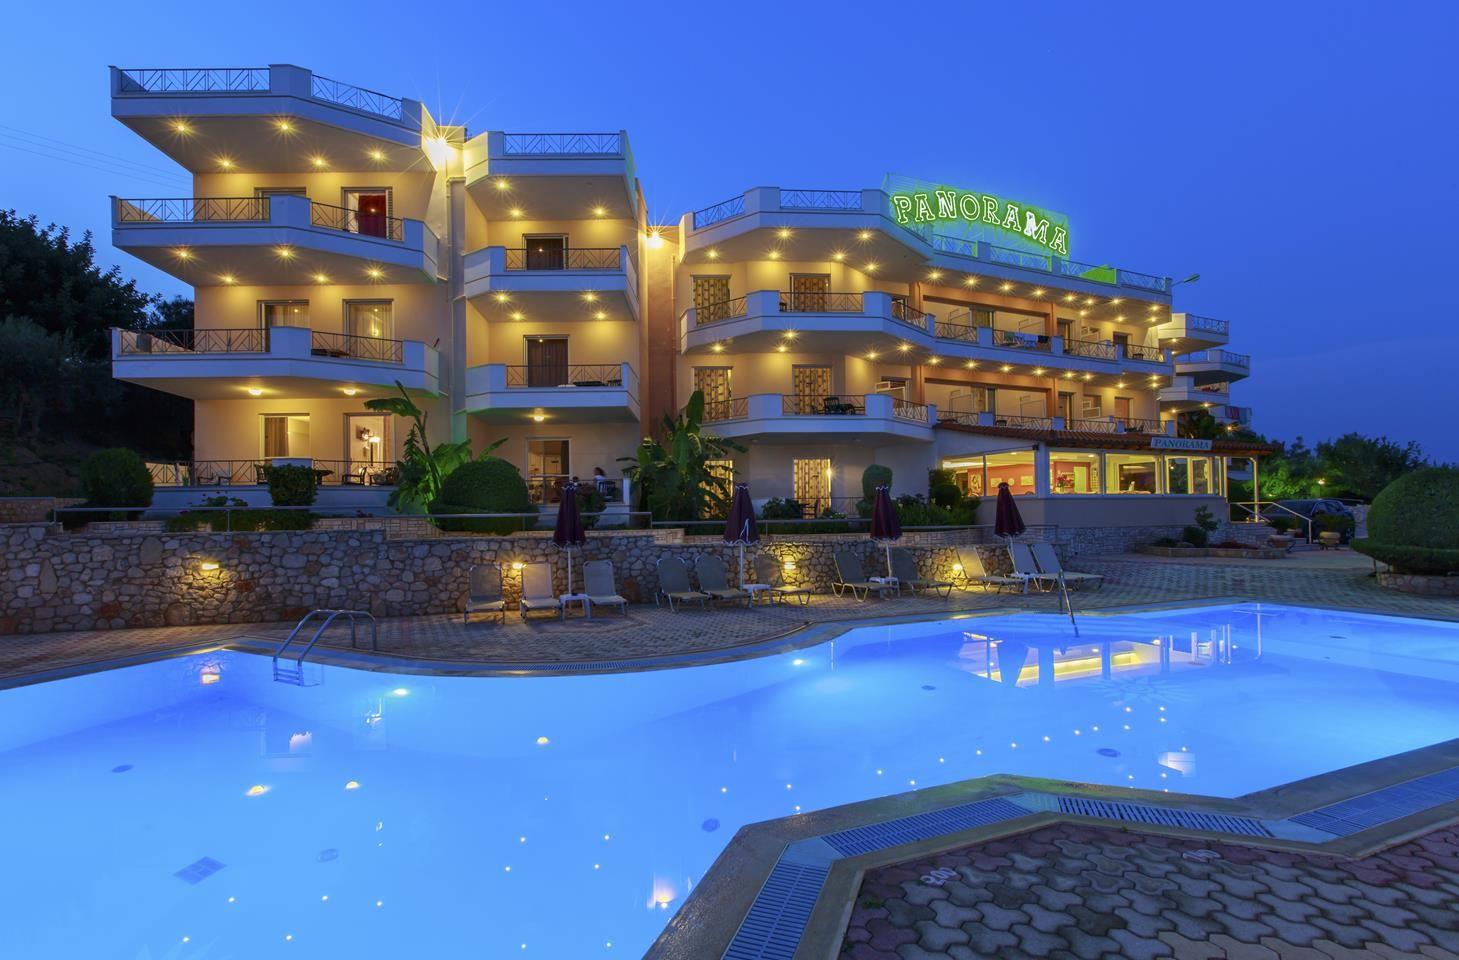 Panorama Hotel - Τολο ✦ 2 Ημερες (1 Διανυκτερευση) ✦ 2 ατομα ✦ Πρωινο ✦ εως 30/11/2020 ✦ Μοναδικη Τοποθεσια!